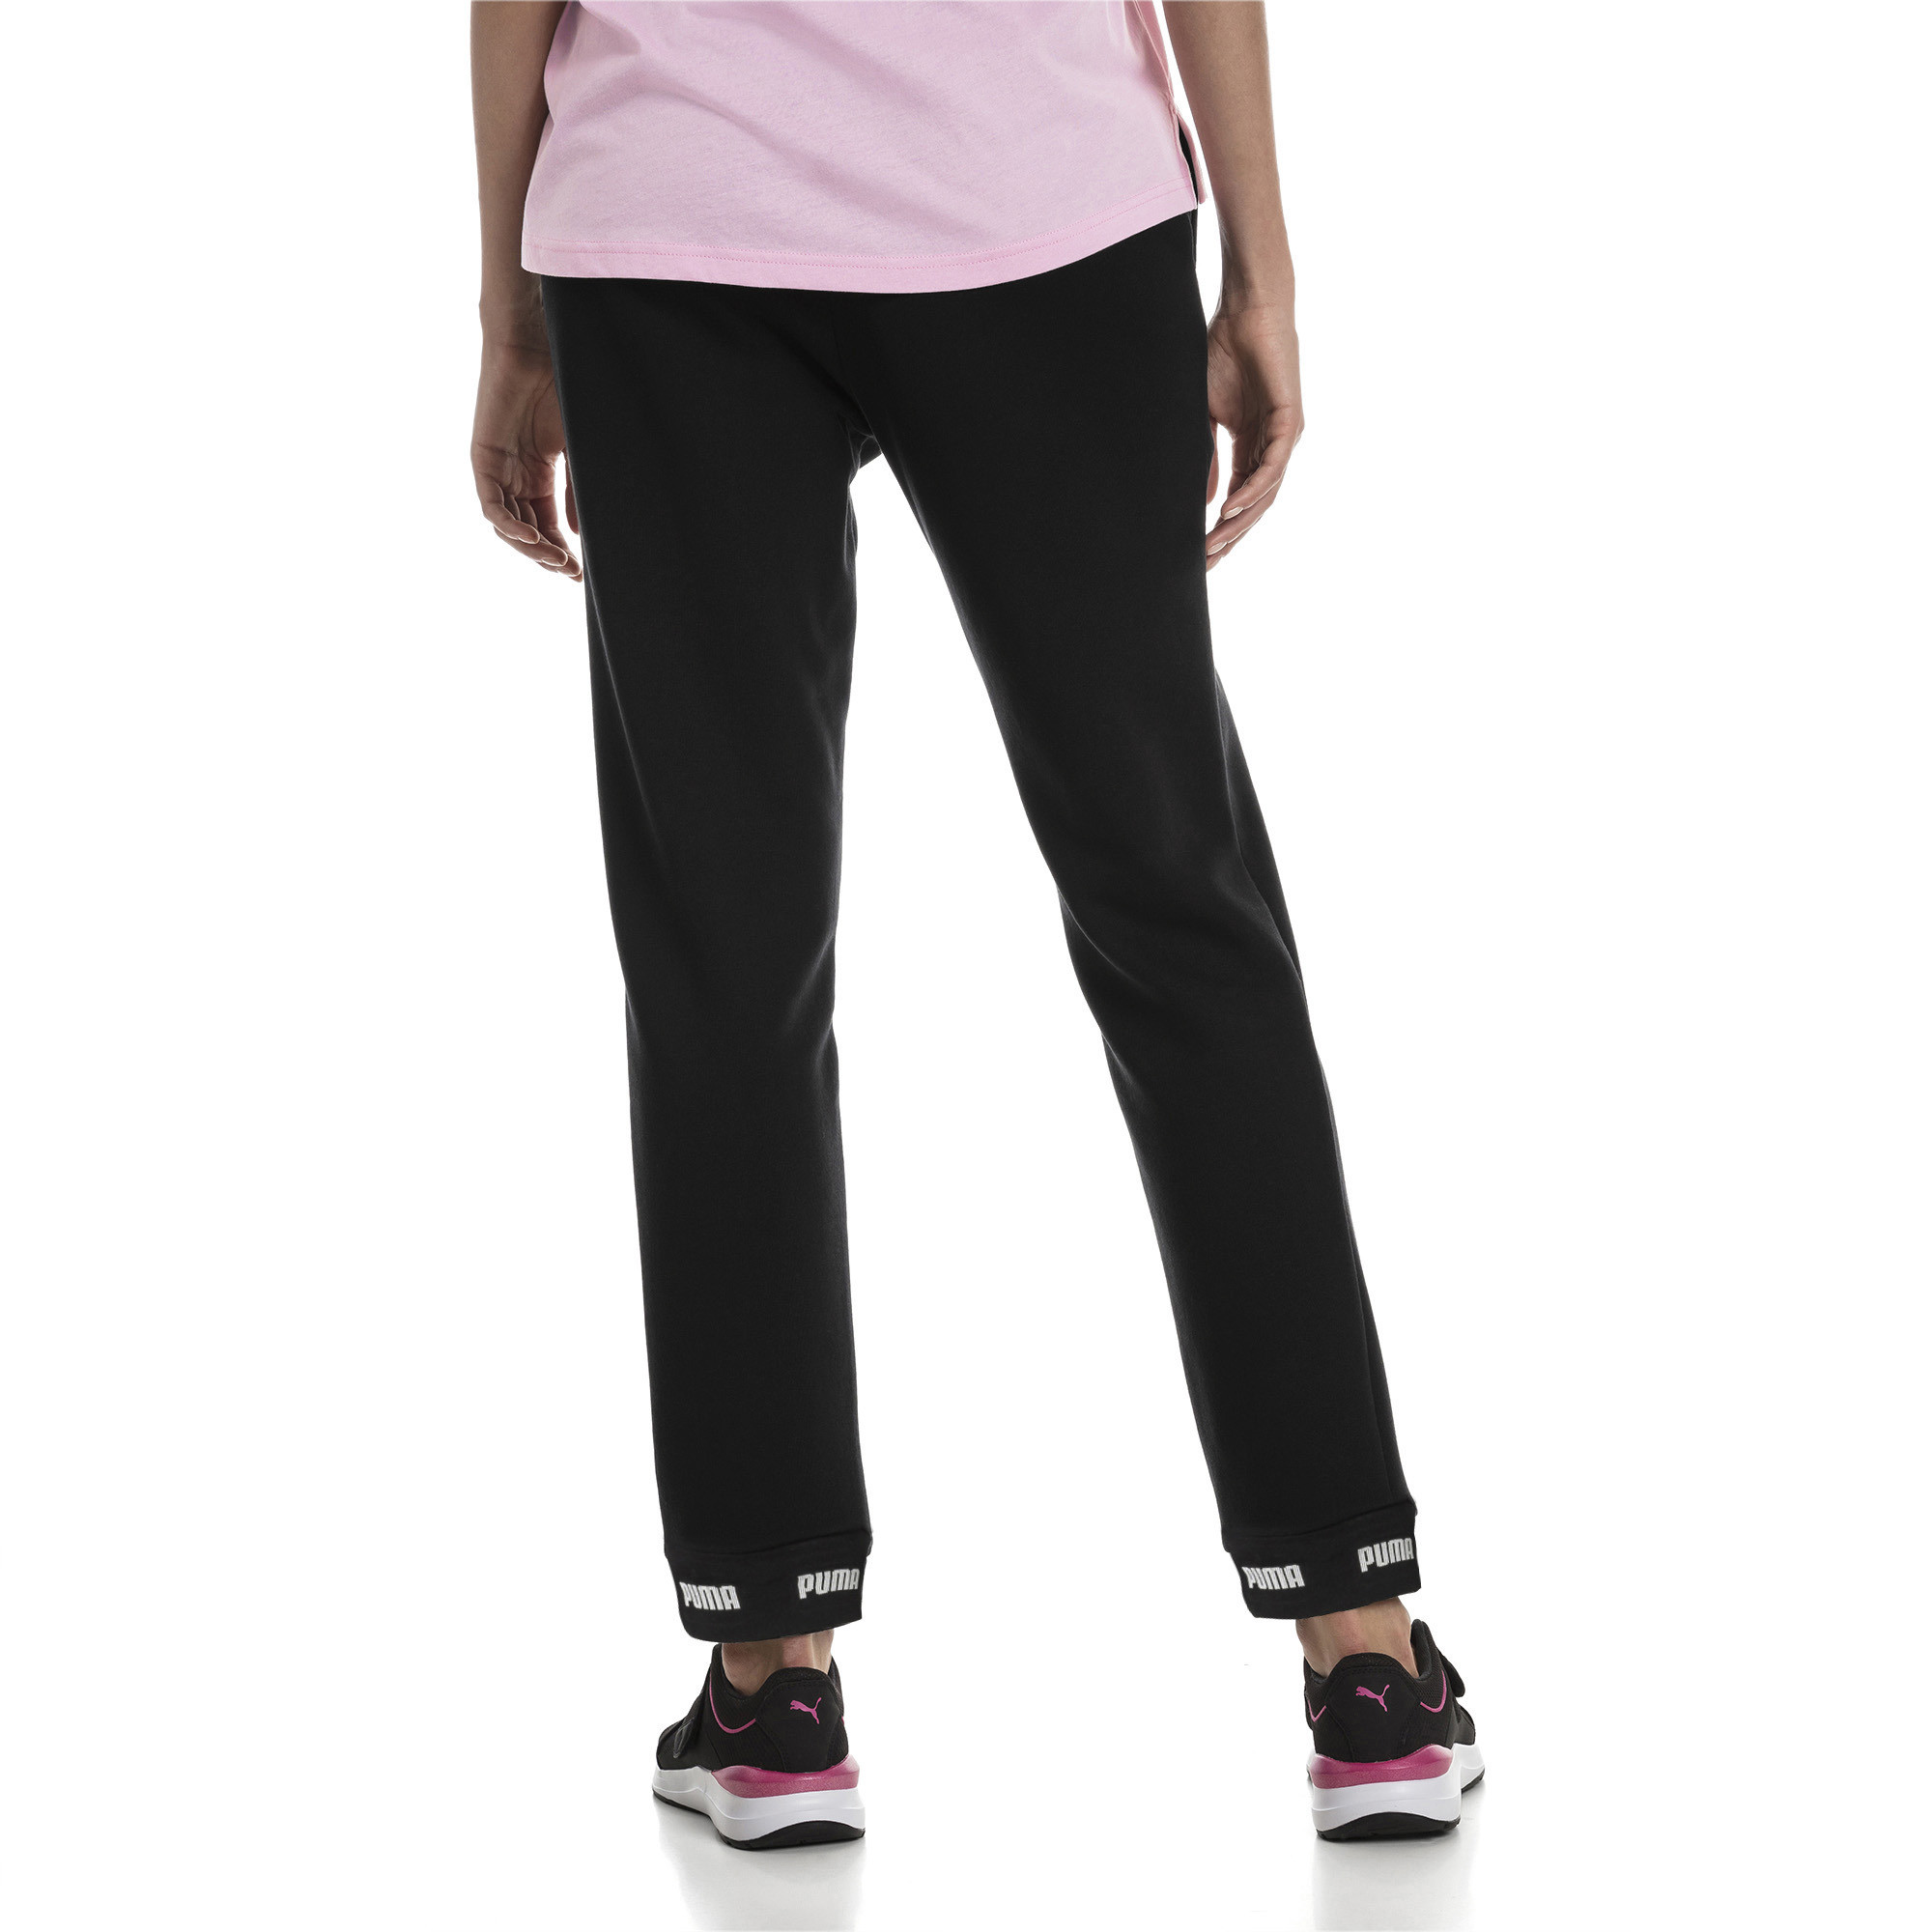 Image Puma Amplified Knitted Women's Sweatpants #2